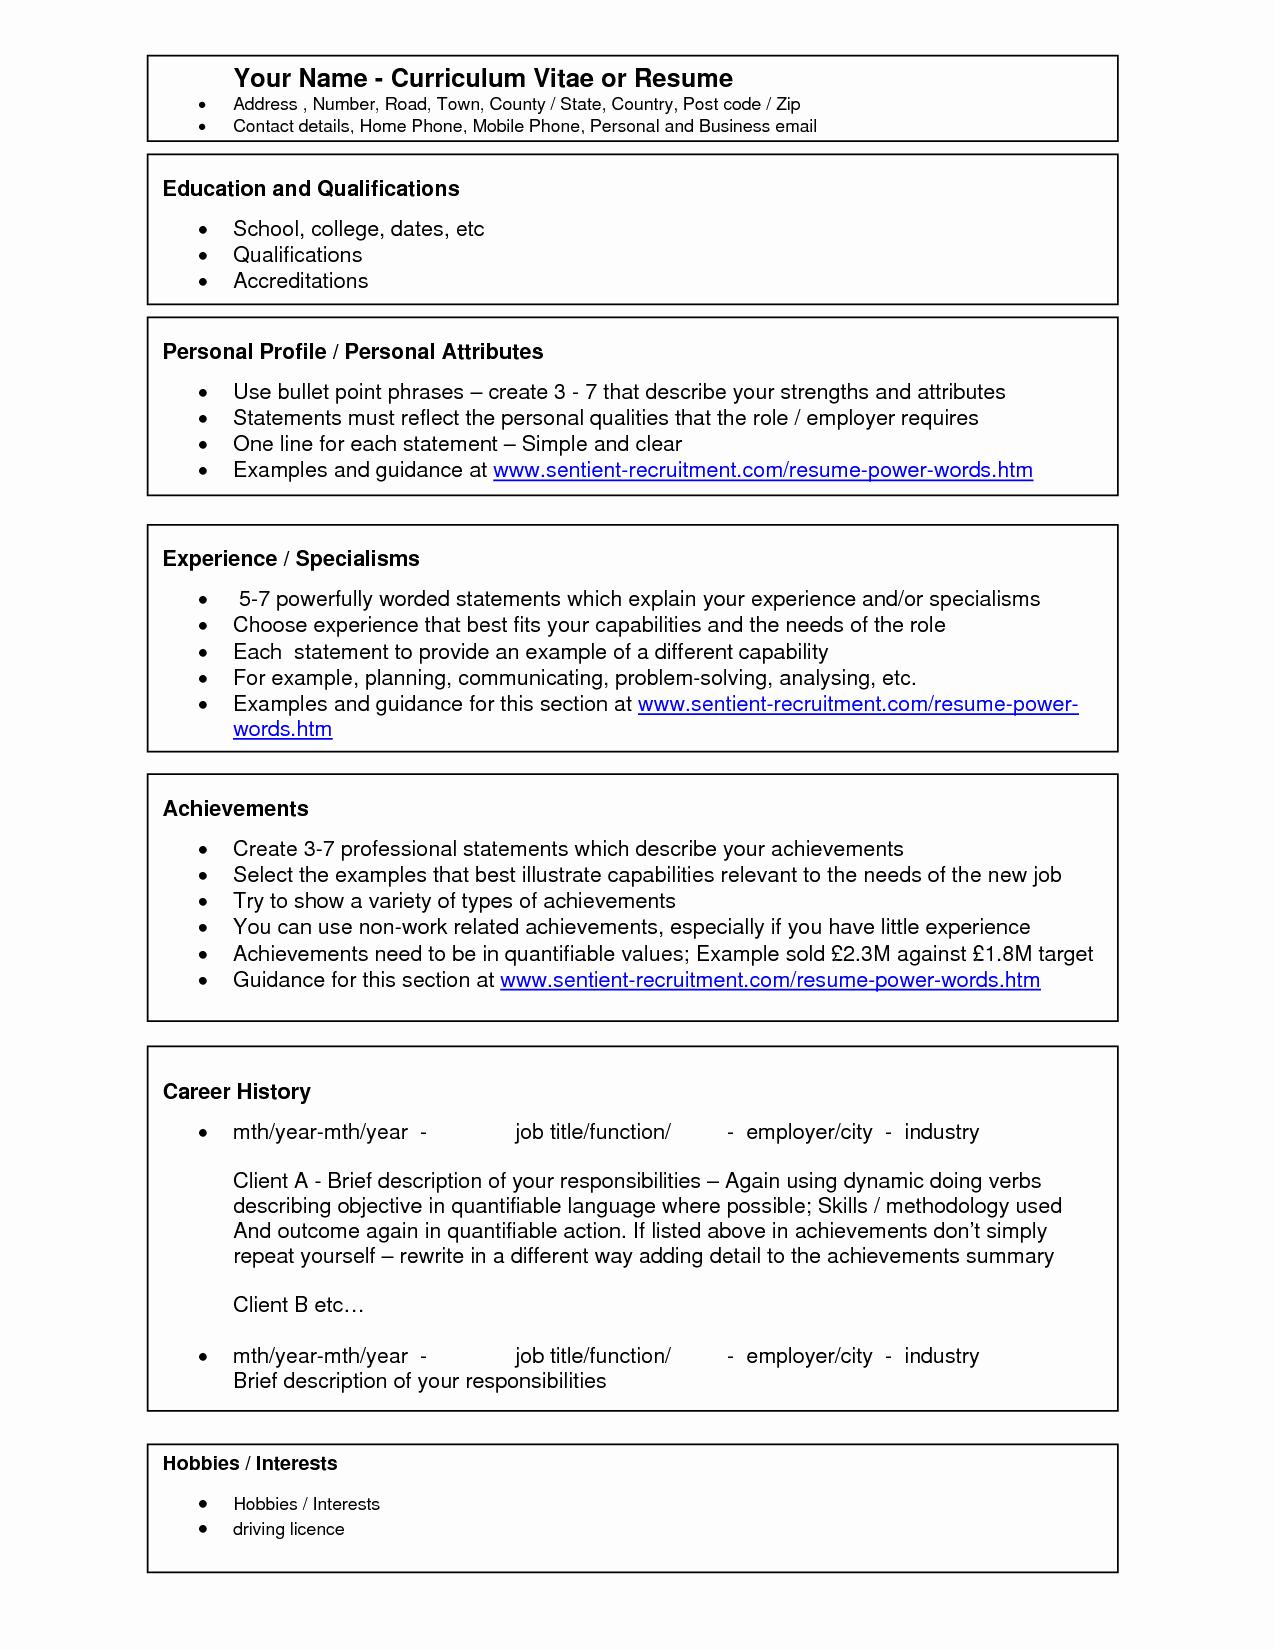 Resume Template Microsoft Word 2003 Unique Resume Templates In Microsoft Word 2003